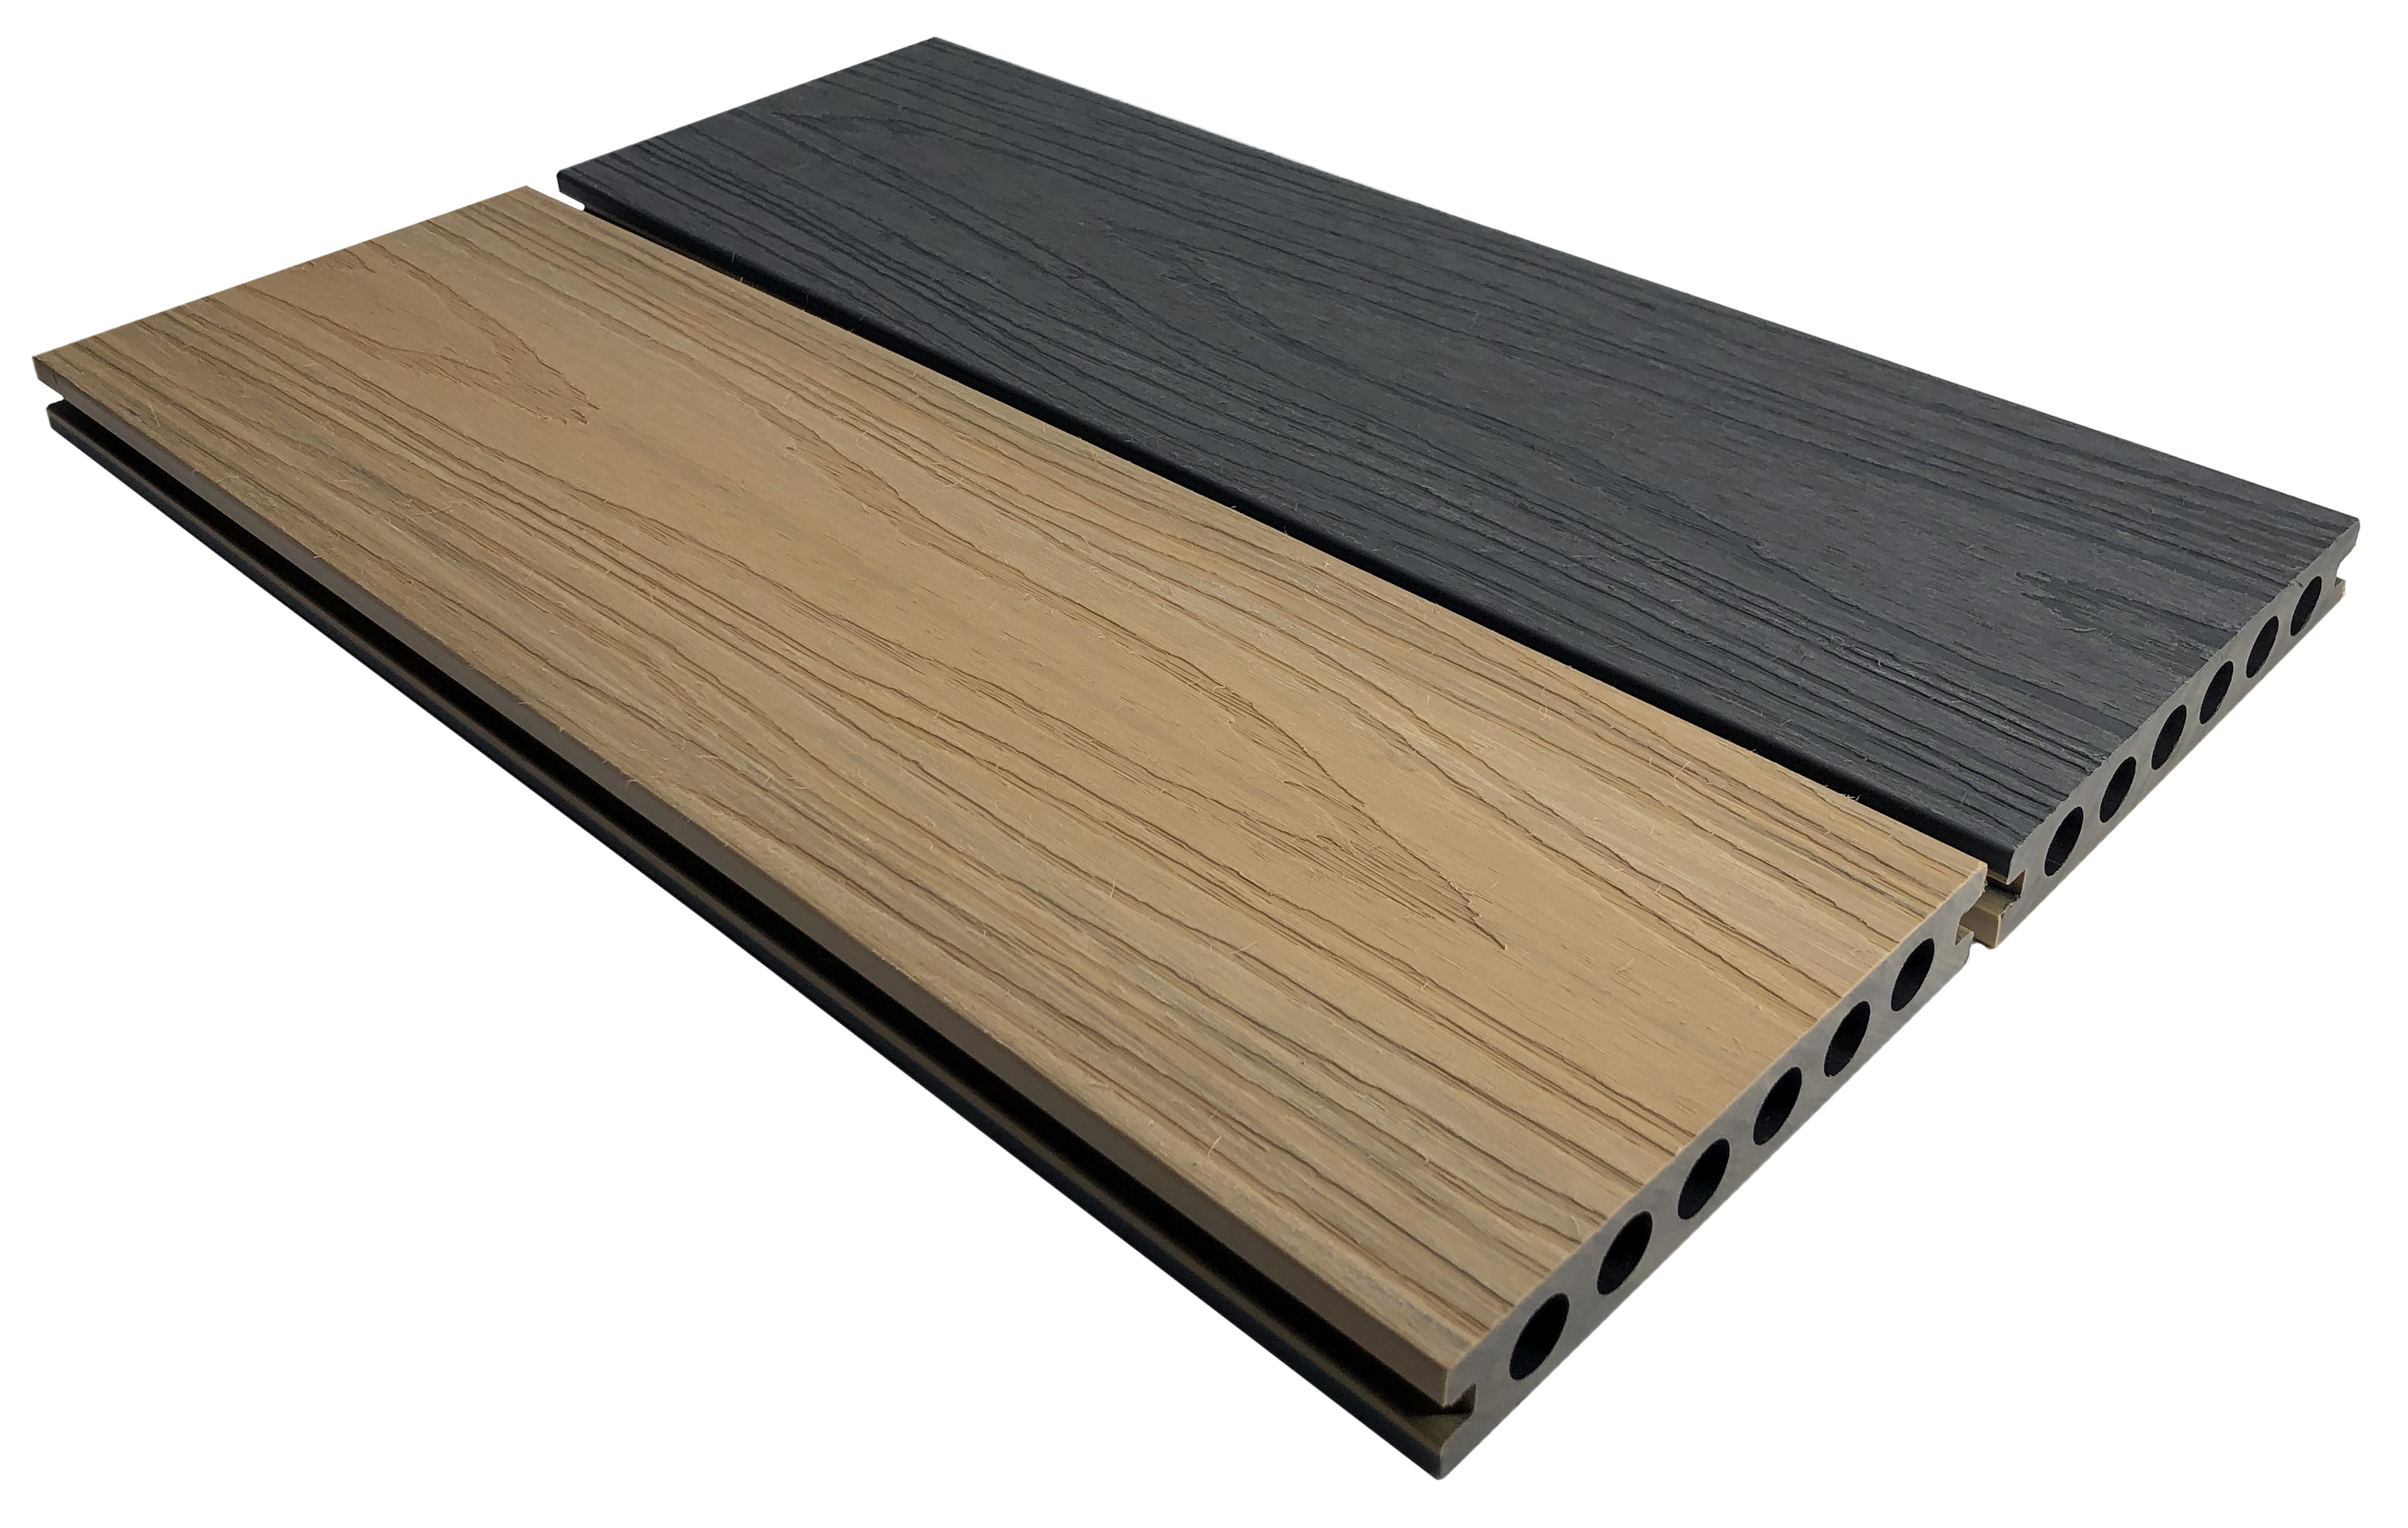 HD Deck Dual Natural Oak/Slate (Price per board) 22.5mm x 143mm x 3600mm